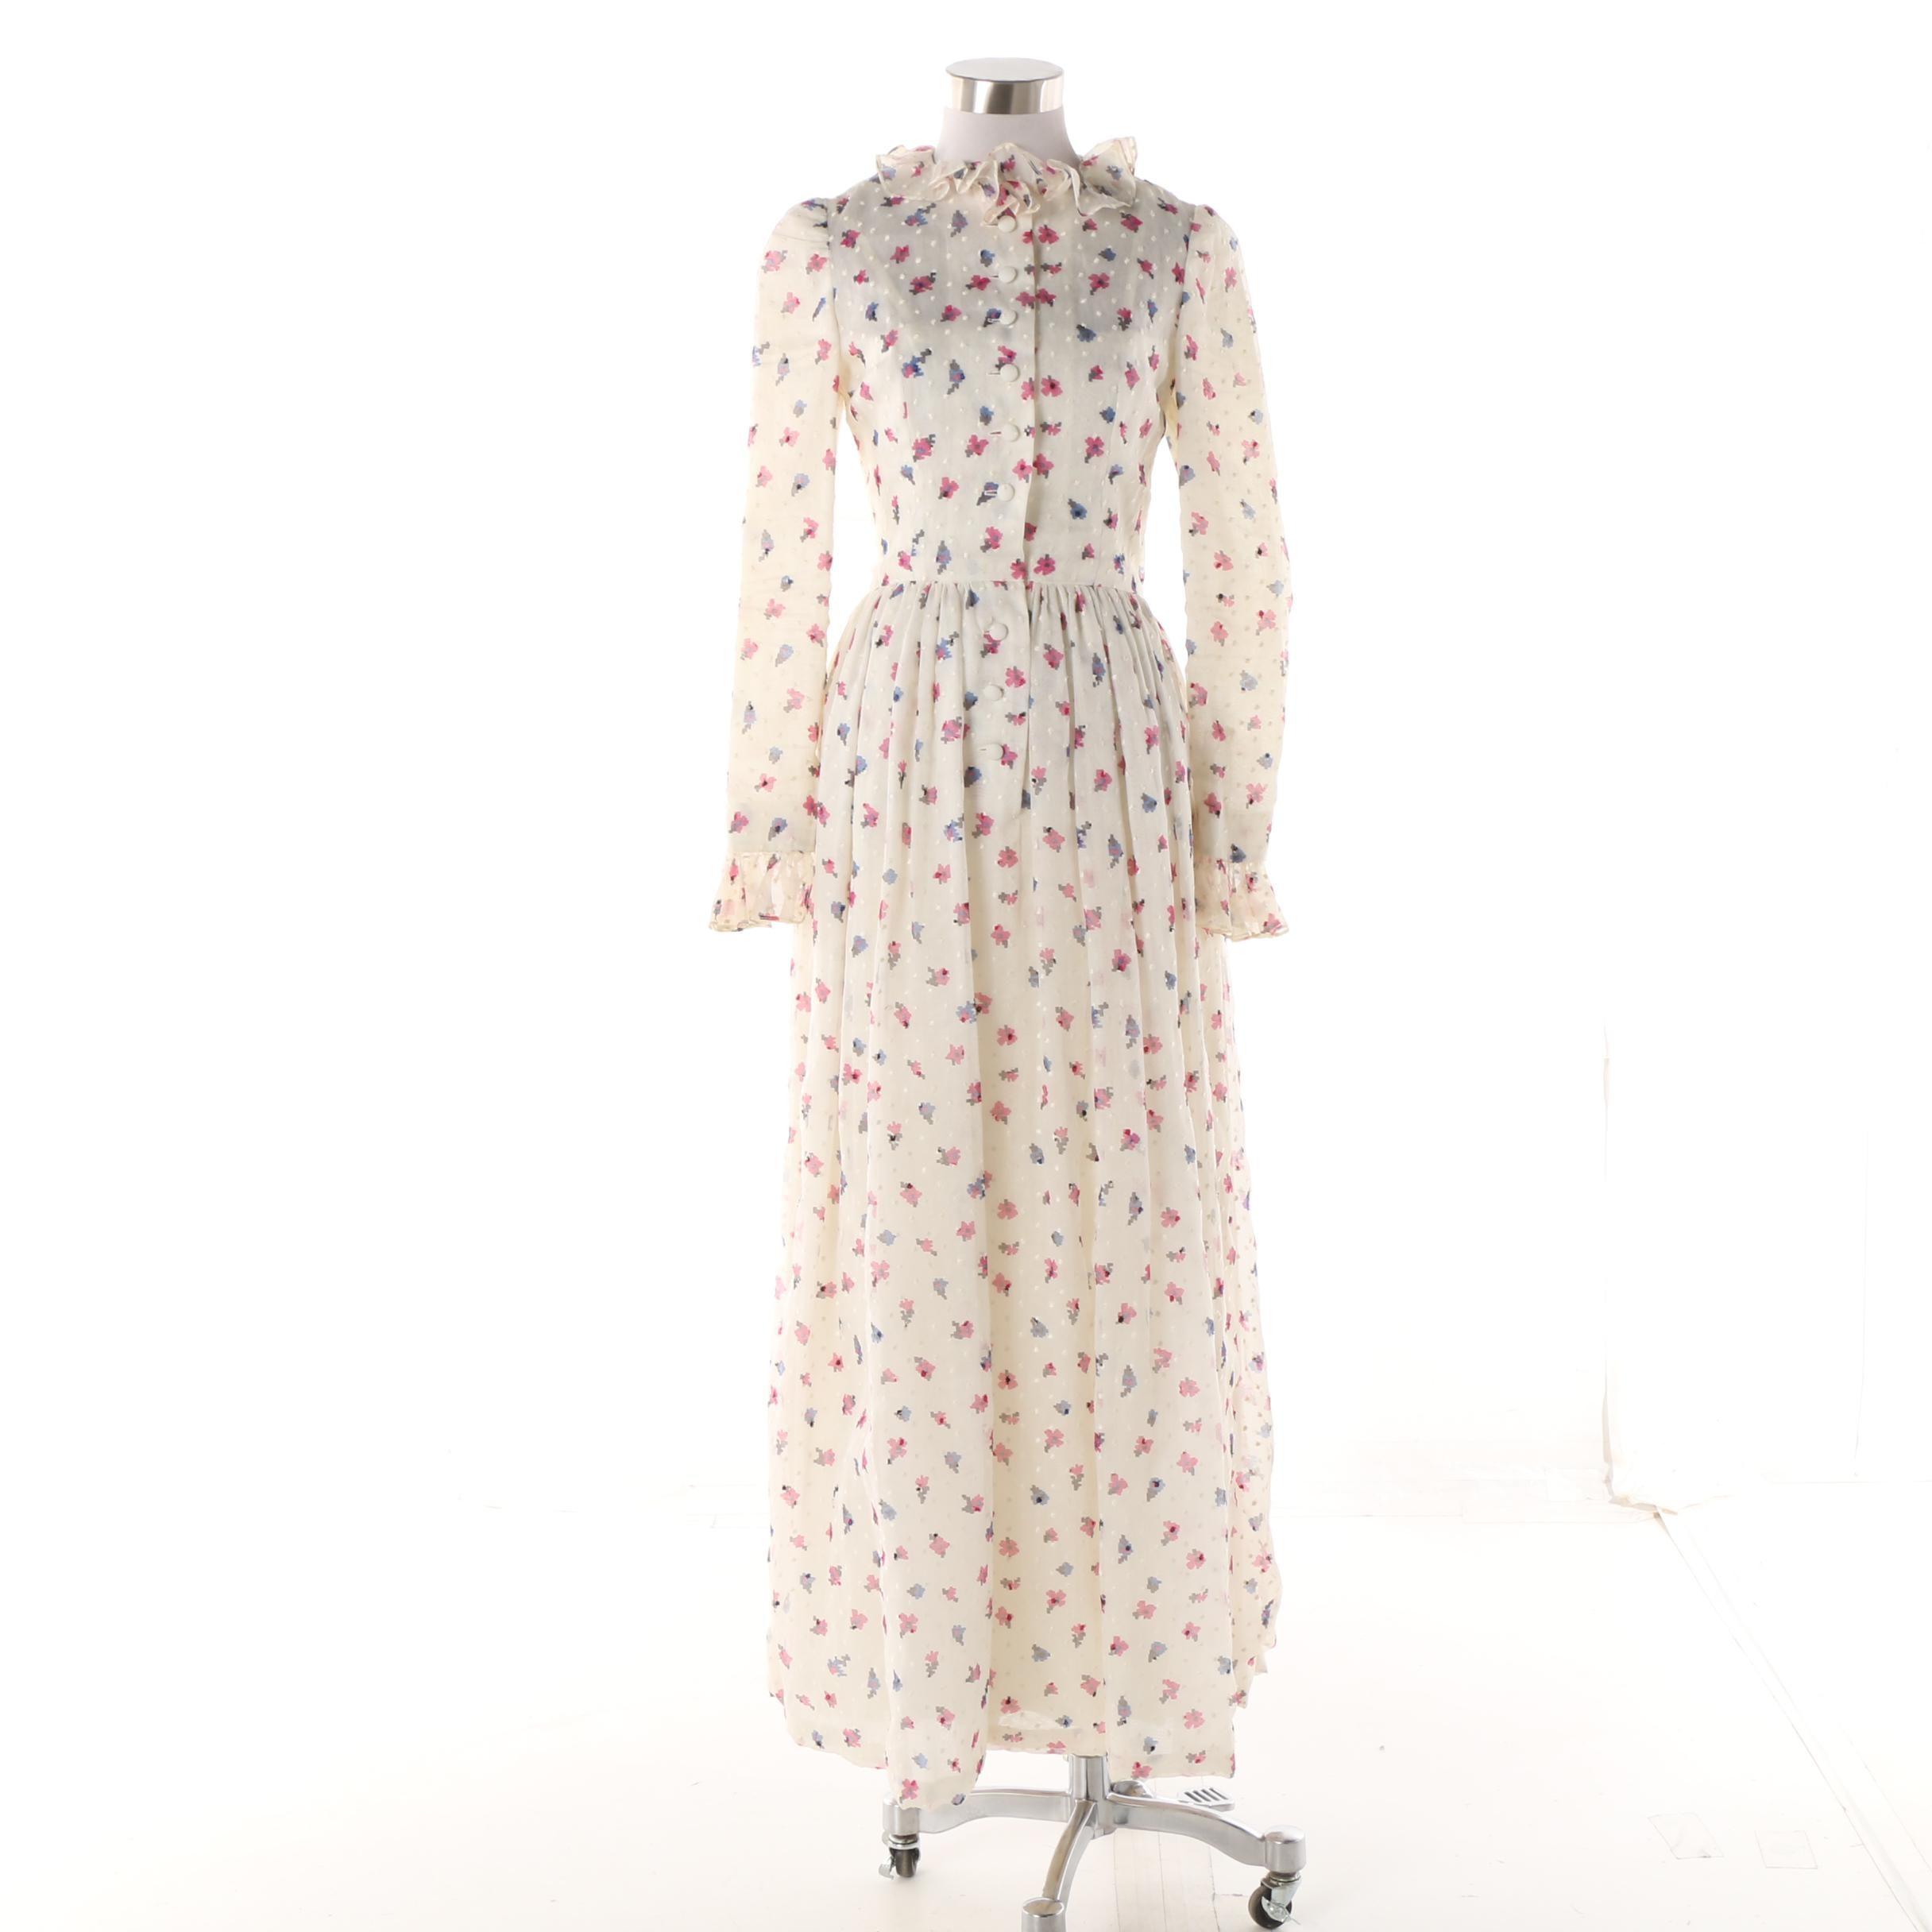 Gérard Pipart Nina Ricci for Bonwit Teller Swiss Dot Floral Maxi Dress